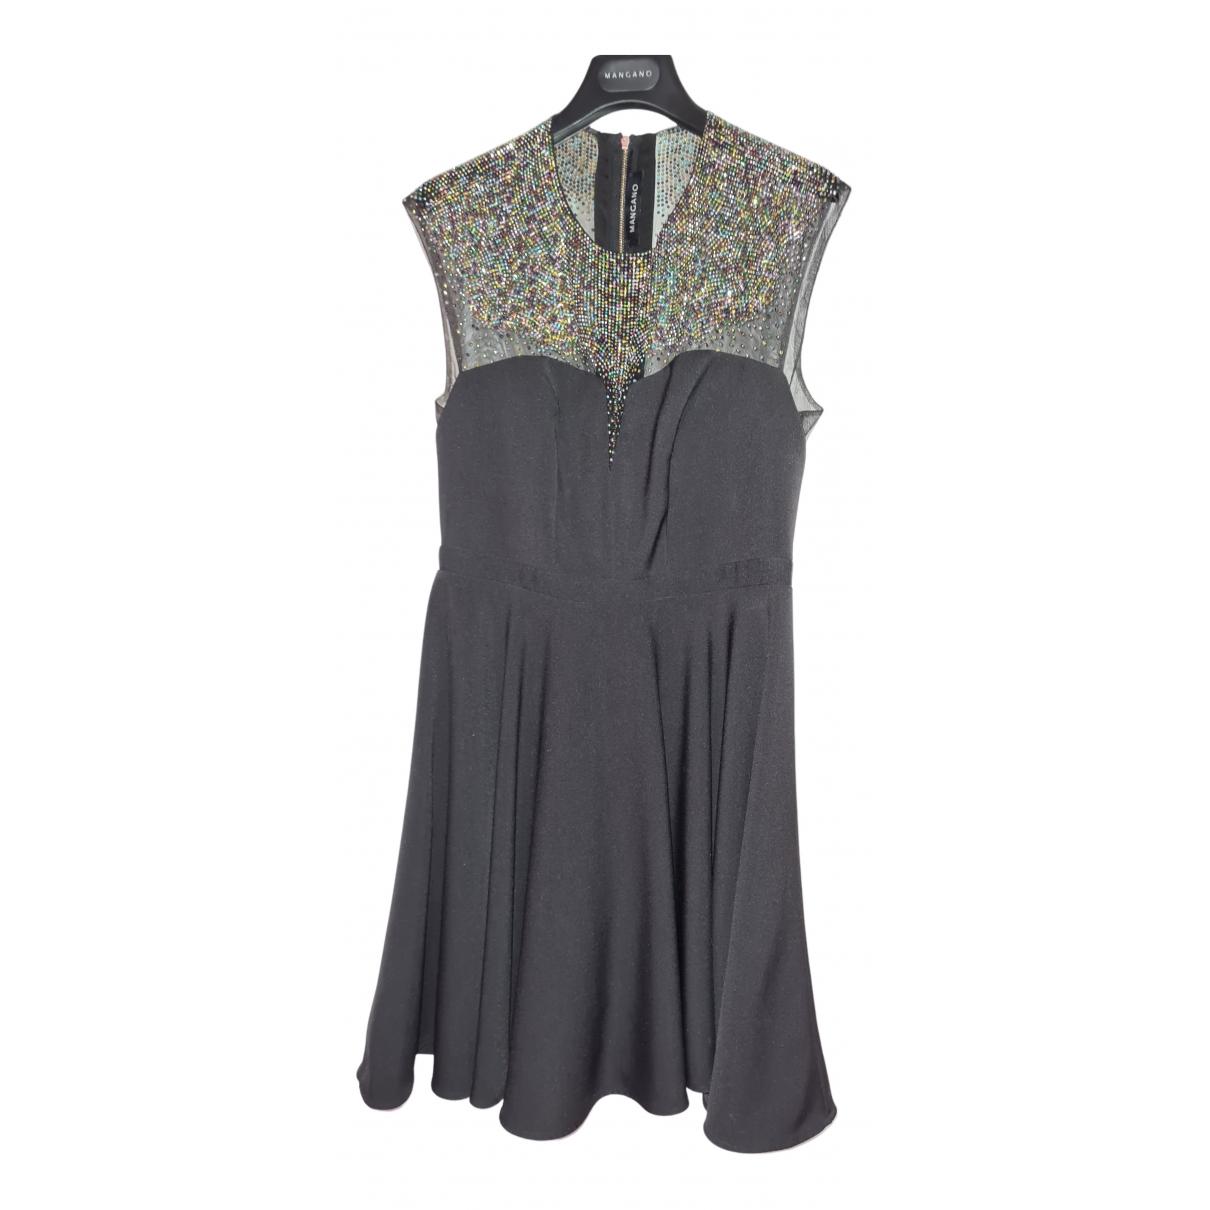 Mangano \N Kleid in  Schwarz Polyester